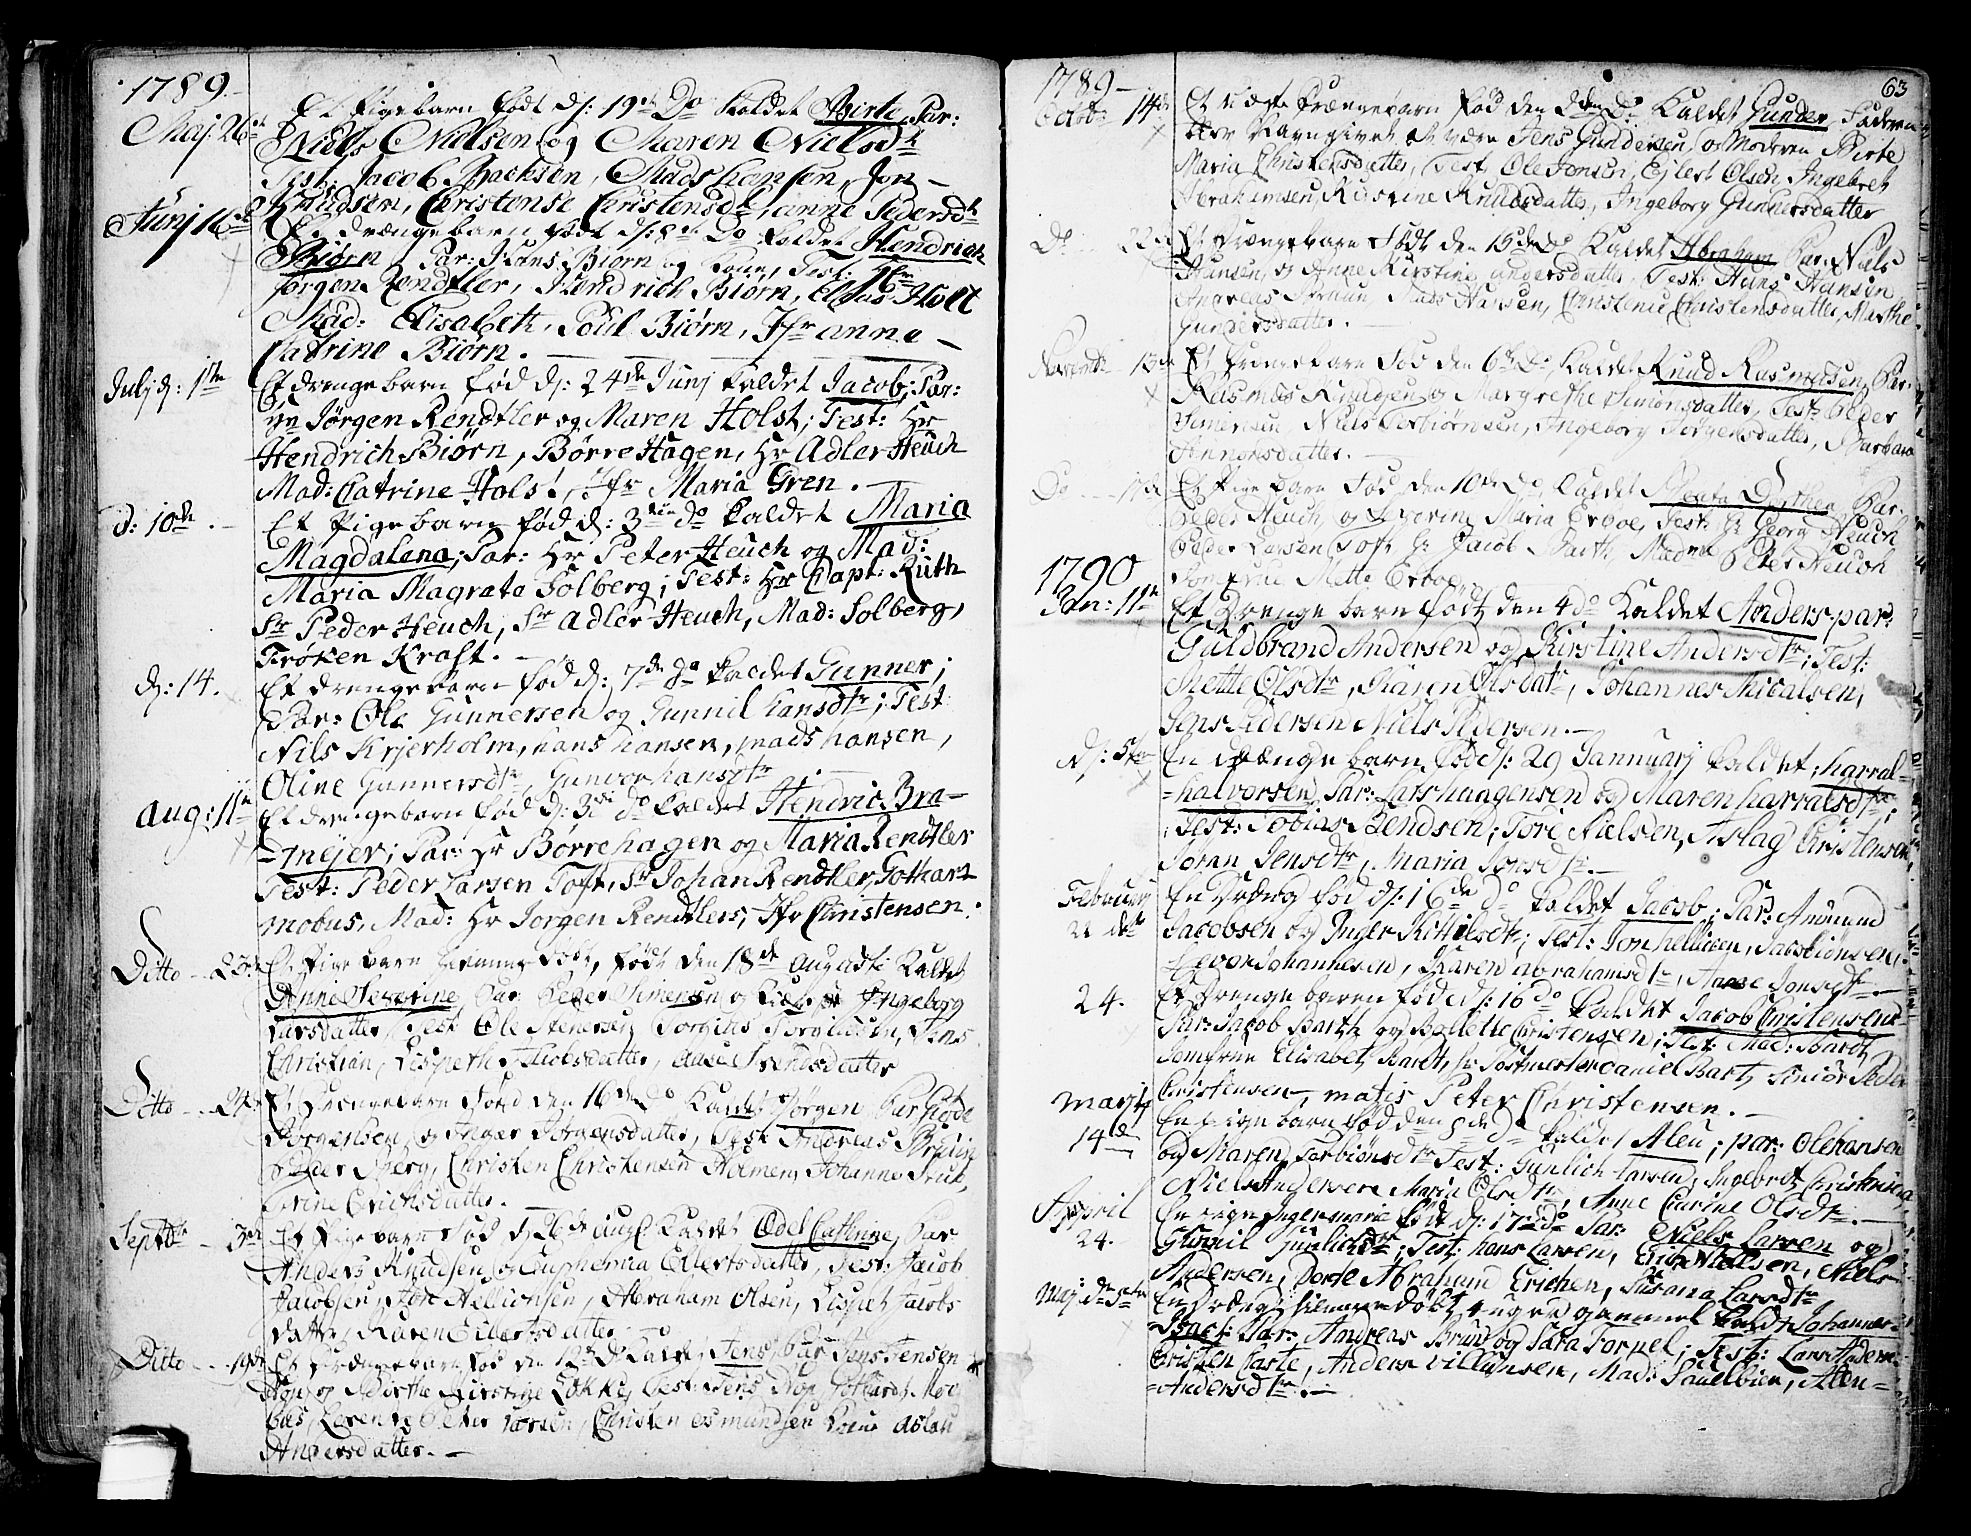 SAKO, Kragerø kirkebøker, F/Fa/L0002: Ministerialbok nr. 2, 1767-1802, s. 63